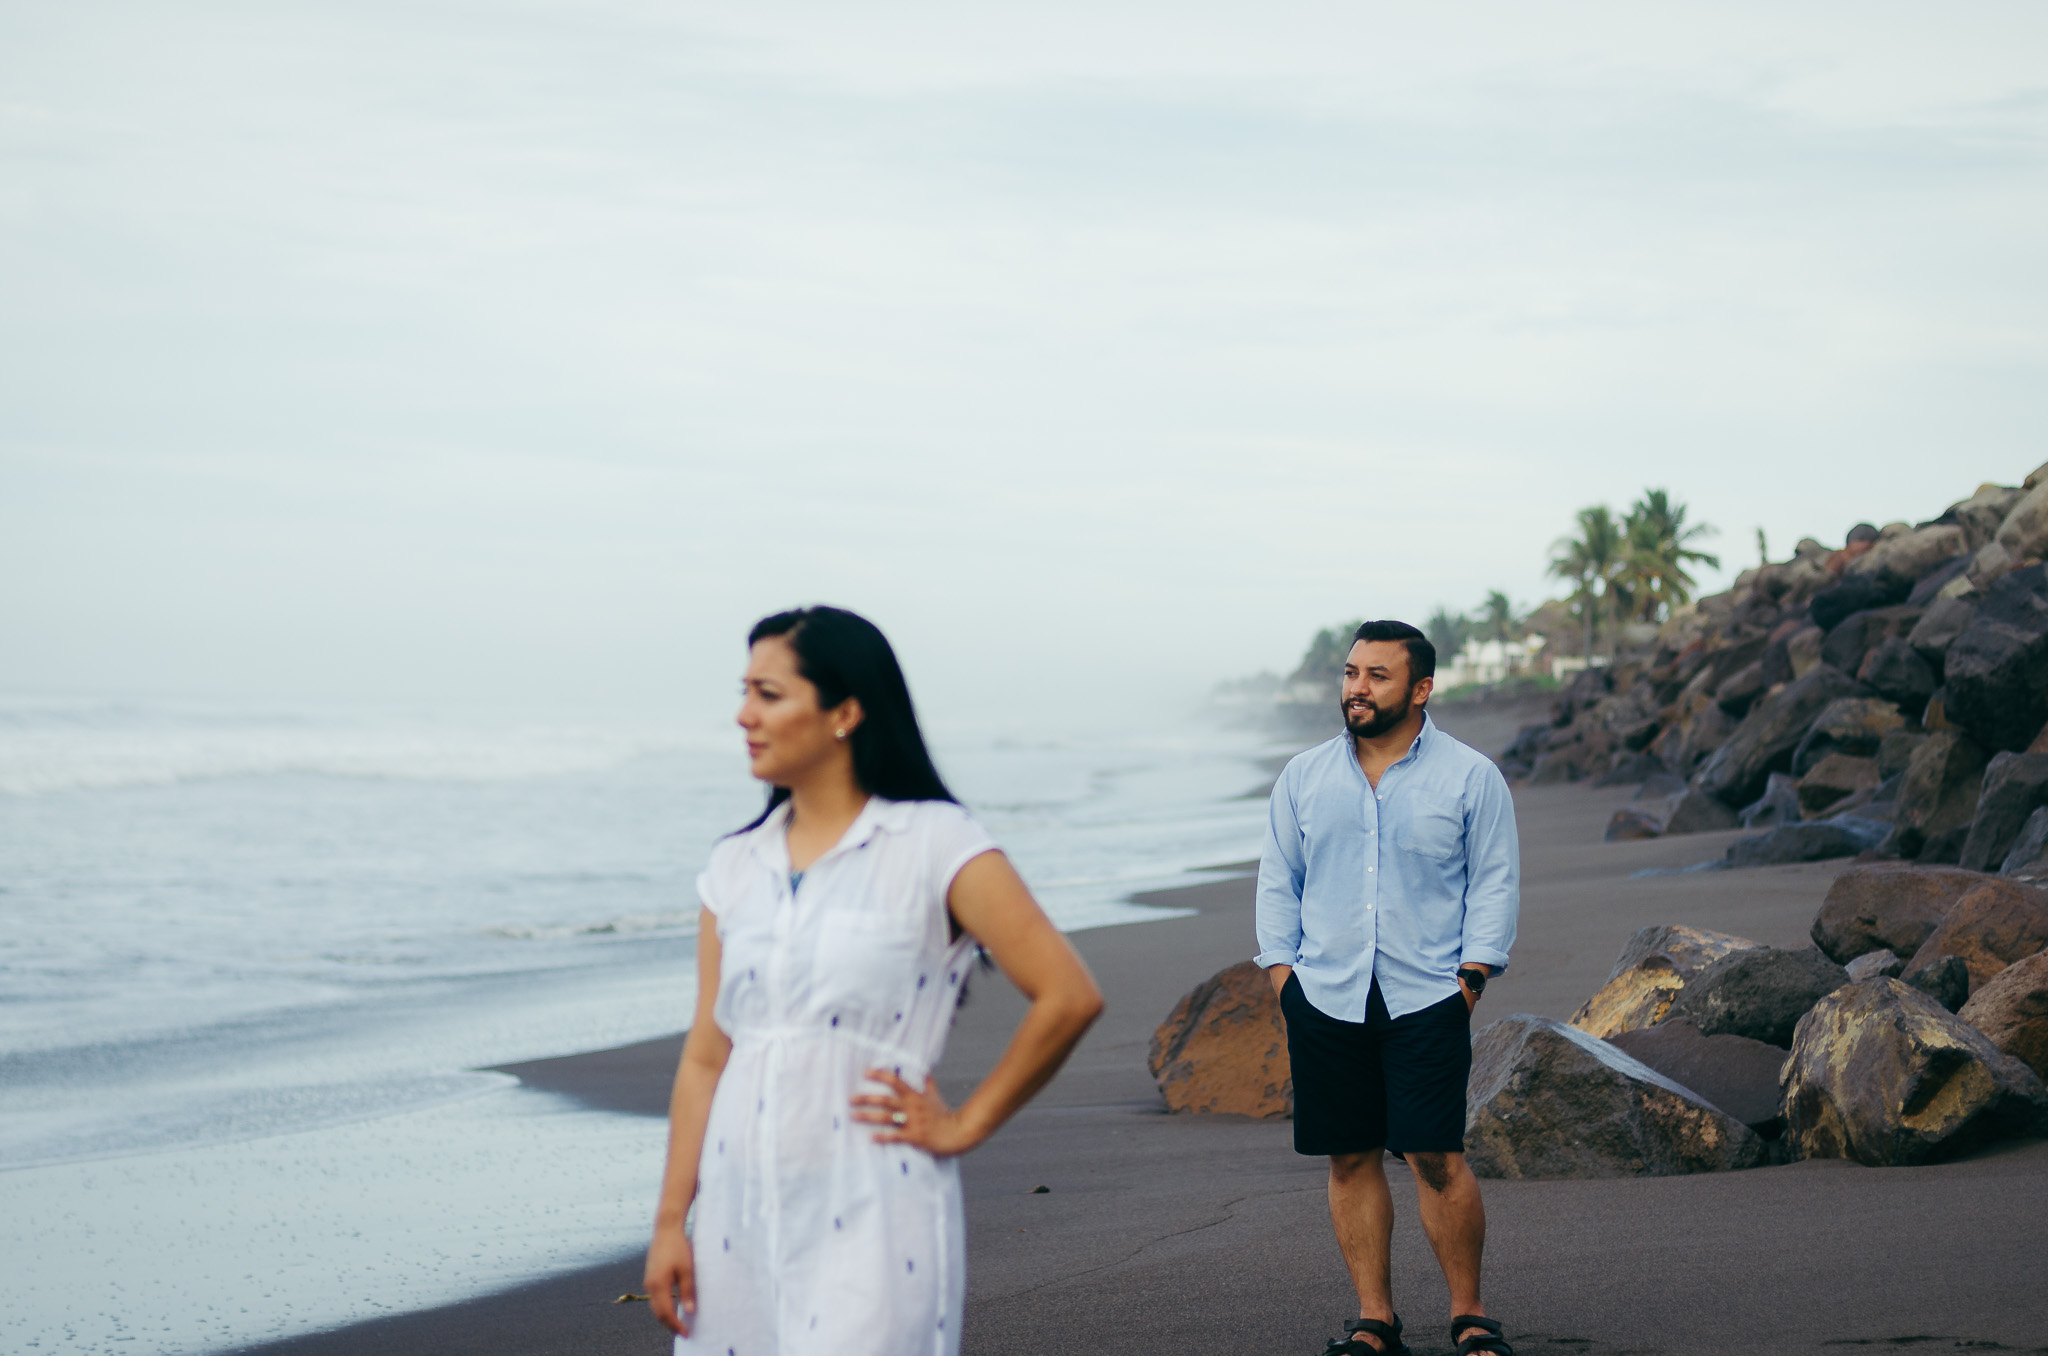 Postboda-Monterrico-Casas_Pelicano-bodas-juan-salazar-fotografo-Guatemala-juansalazarphoto-playa-boda